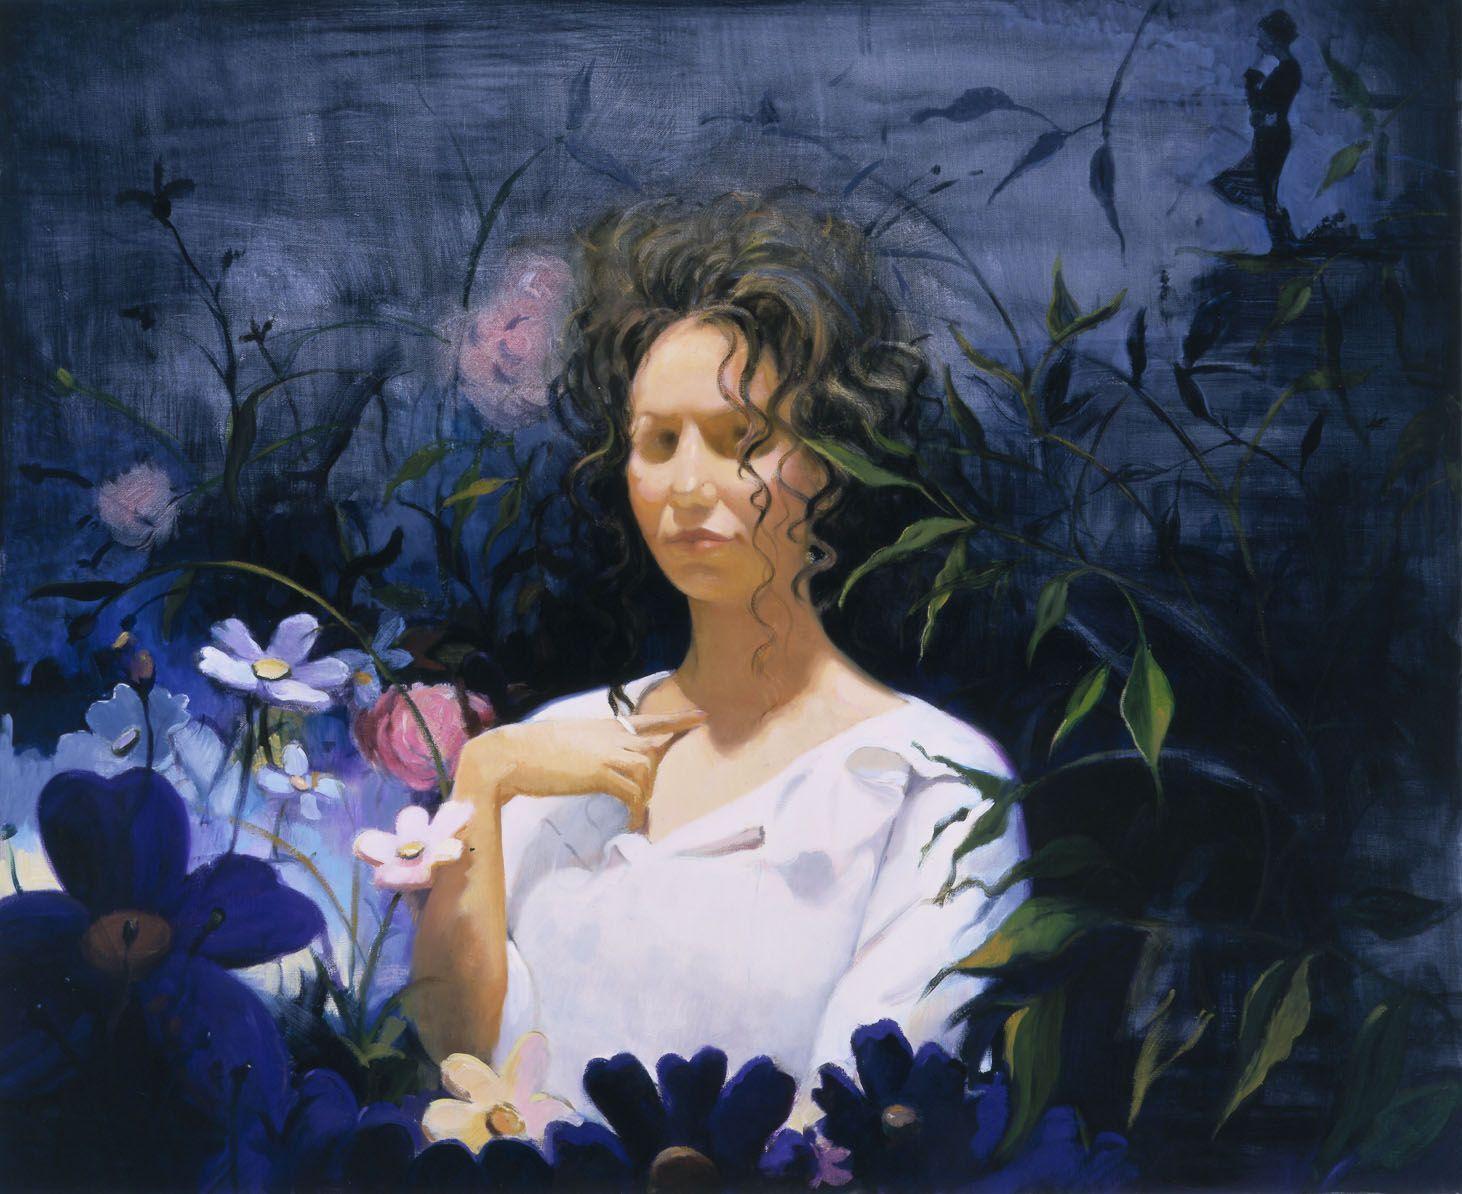 Dark Garden II, 2003, Oil on linen